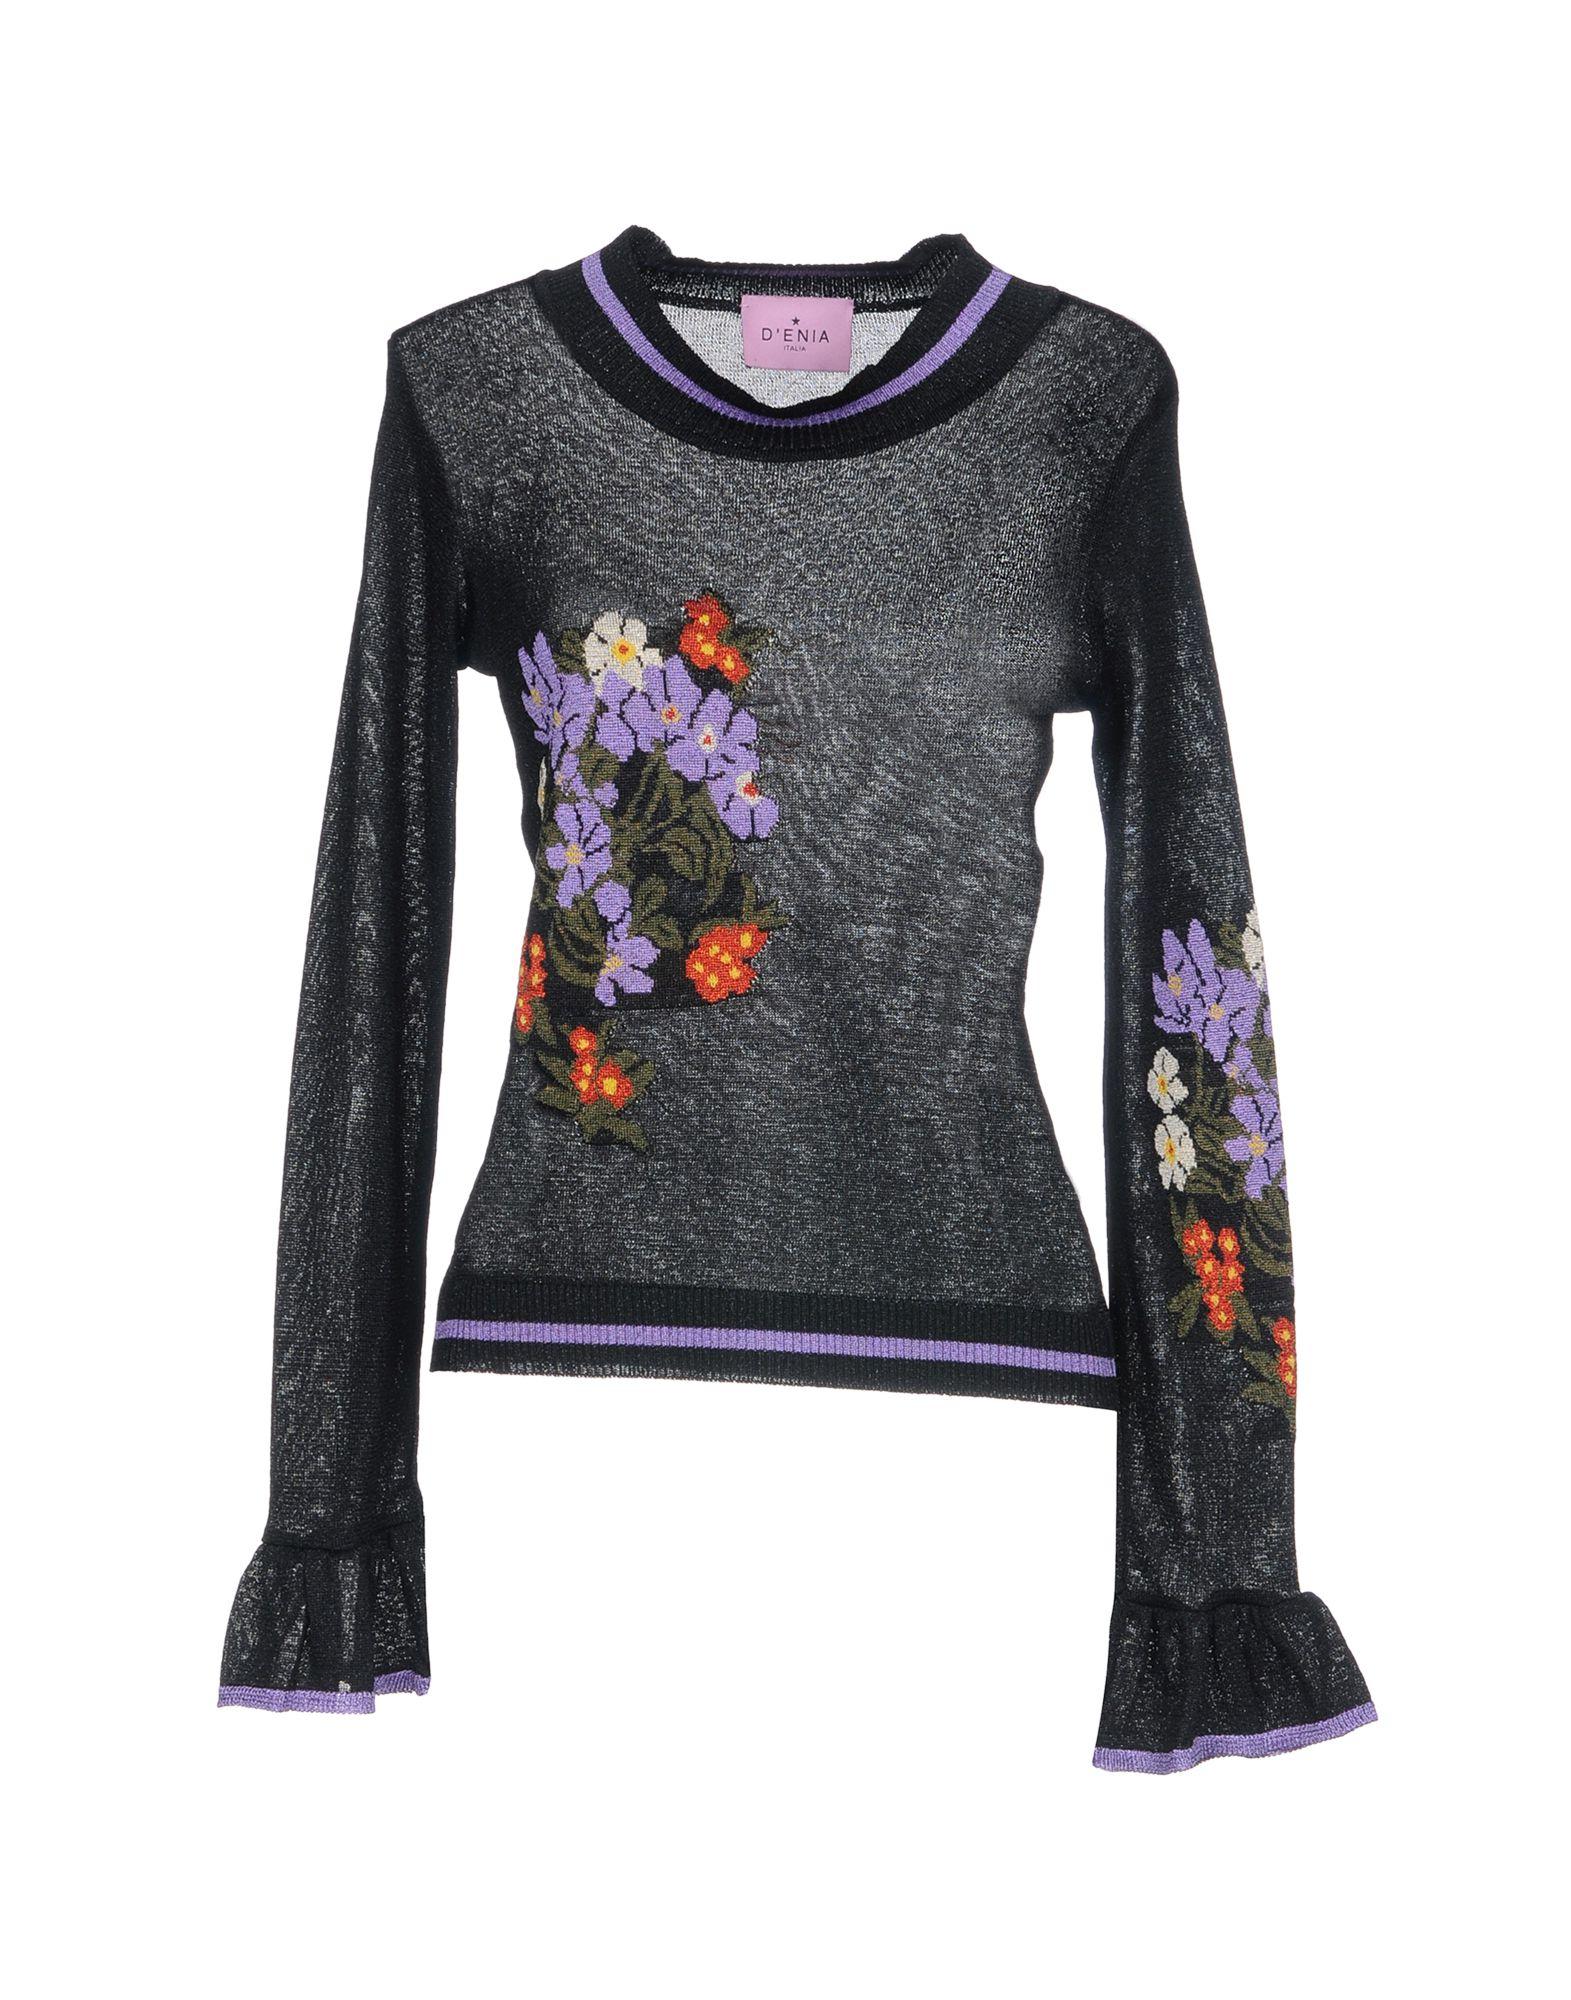 D'ENIA Sweater in Black